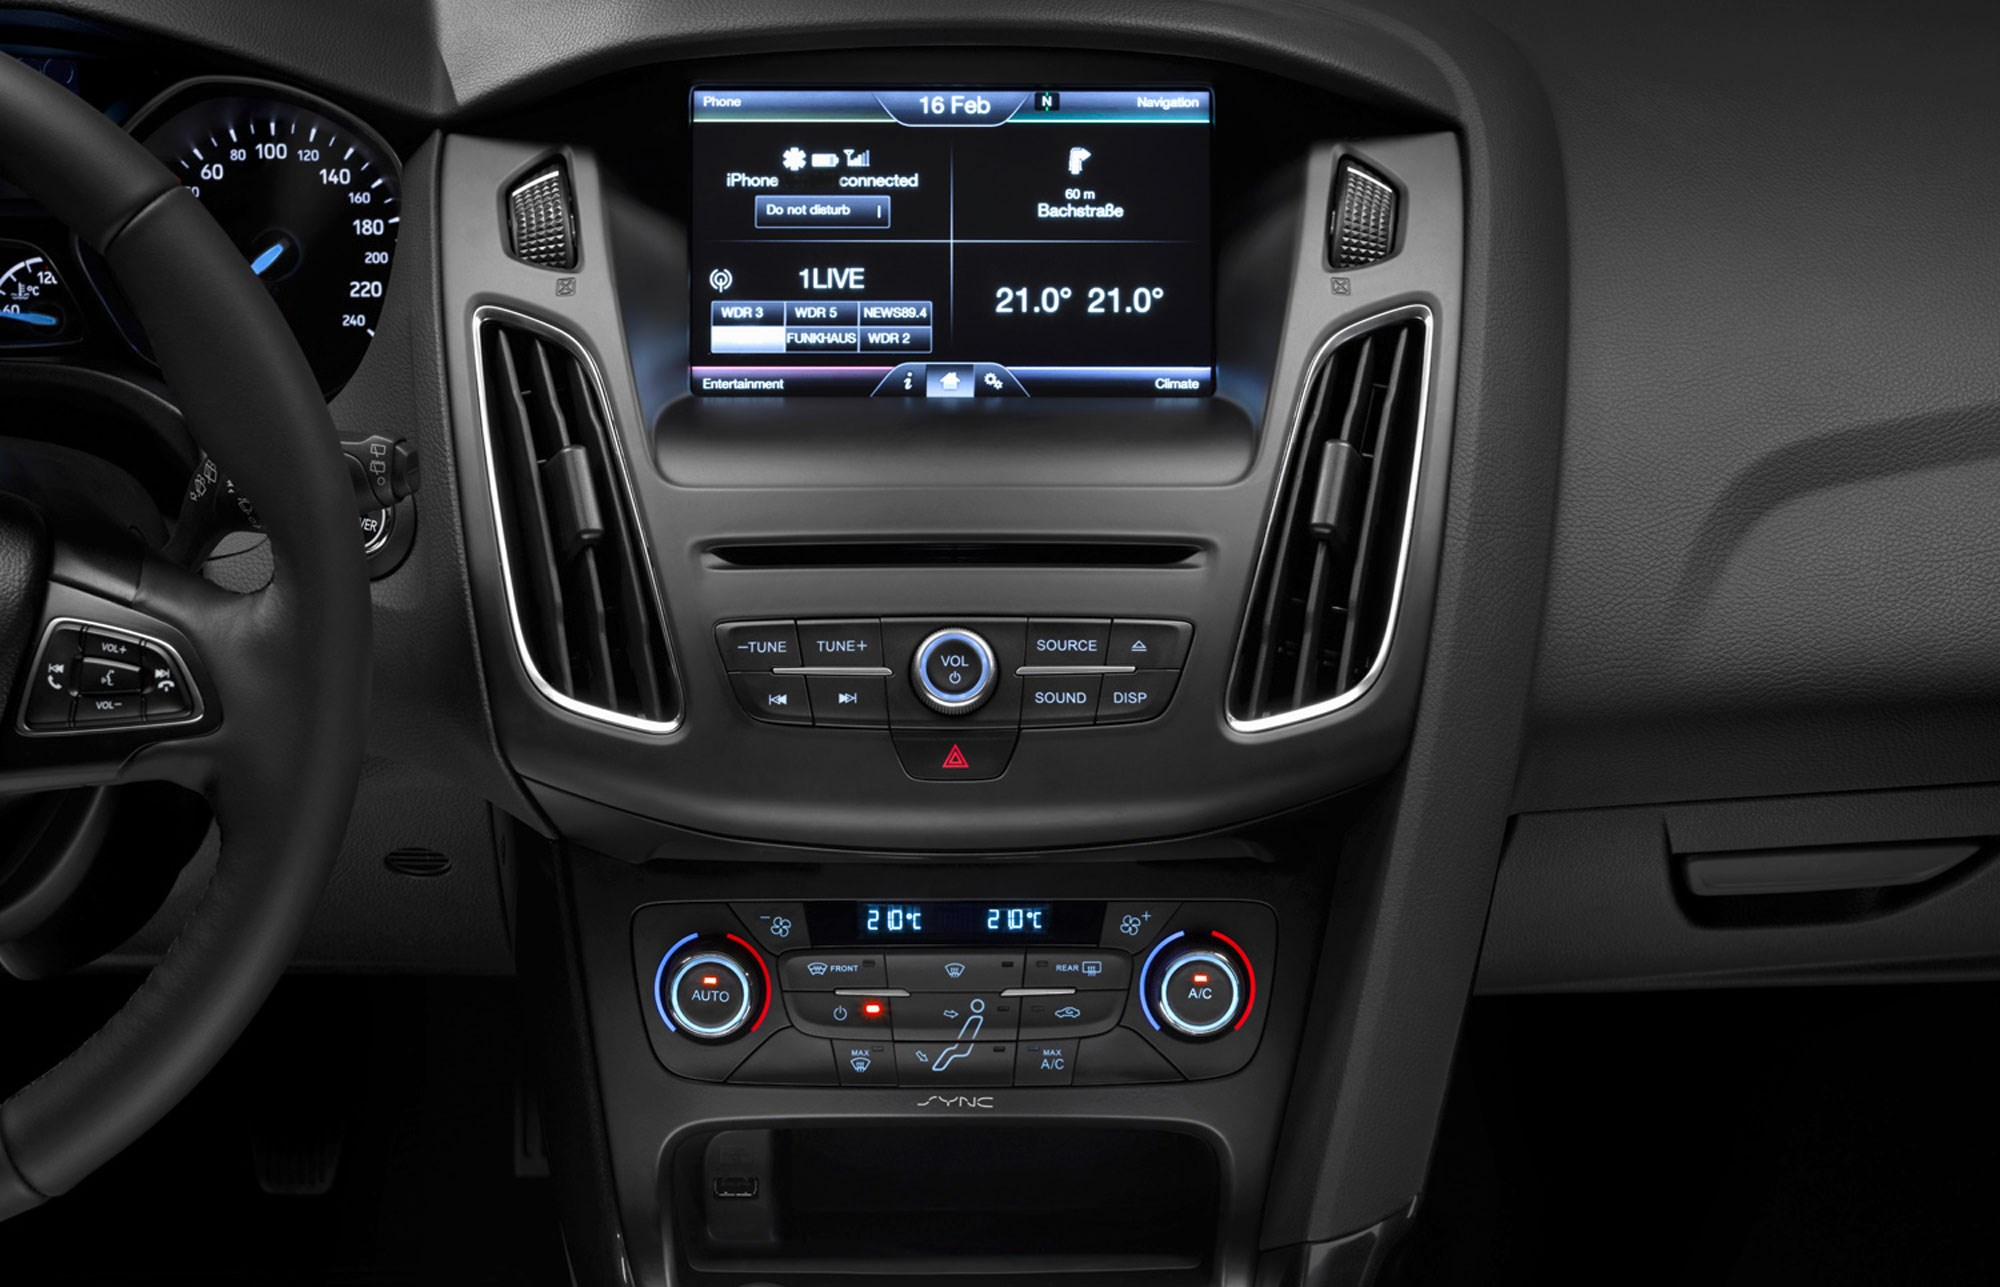 2015 ford focus interior. interioru0027s richer for it new 8 2015 ford focus interior